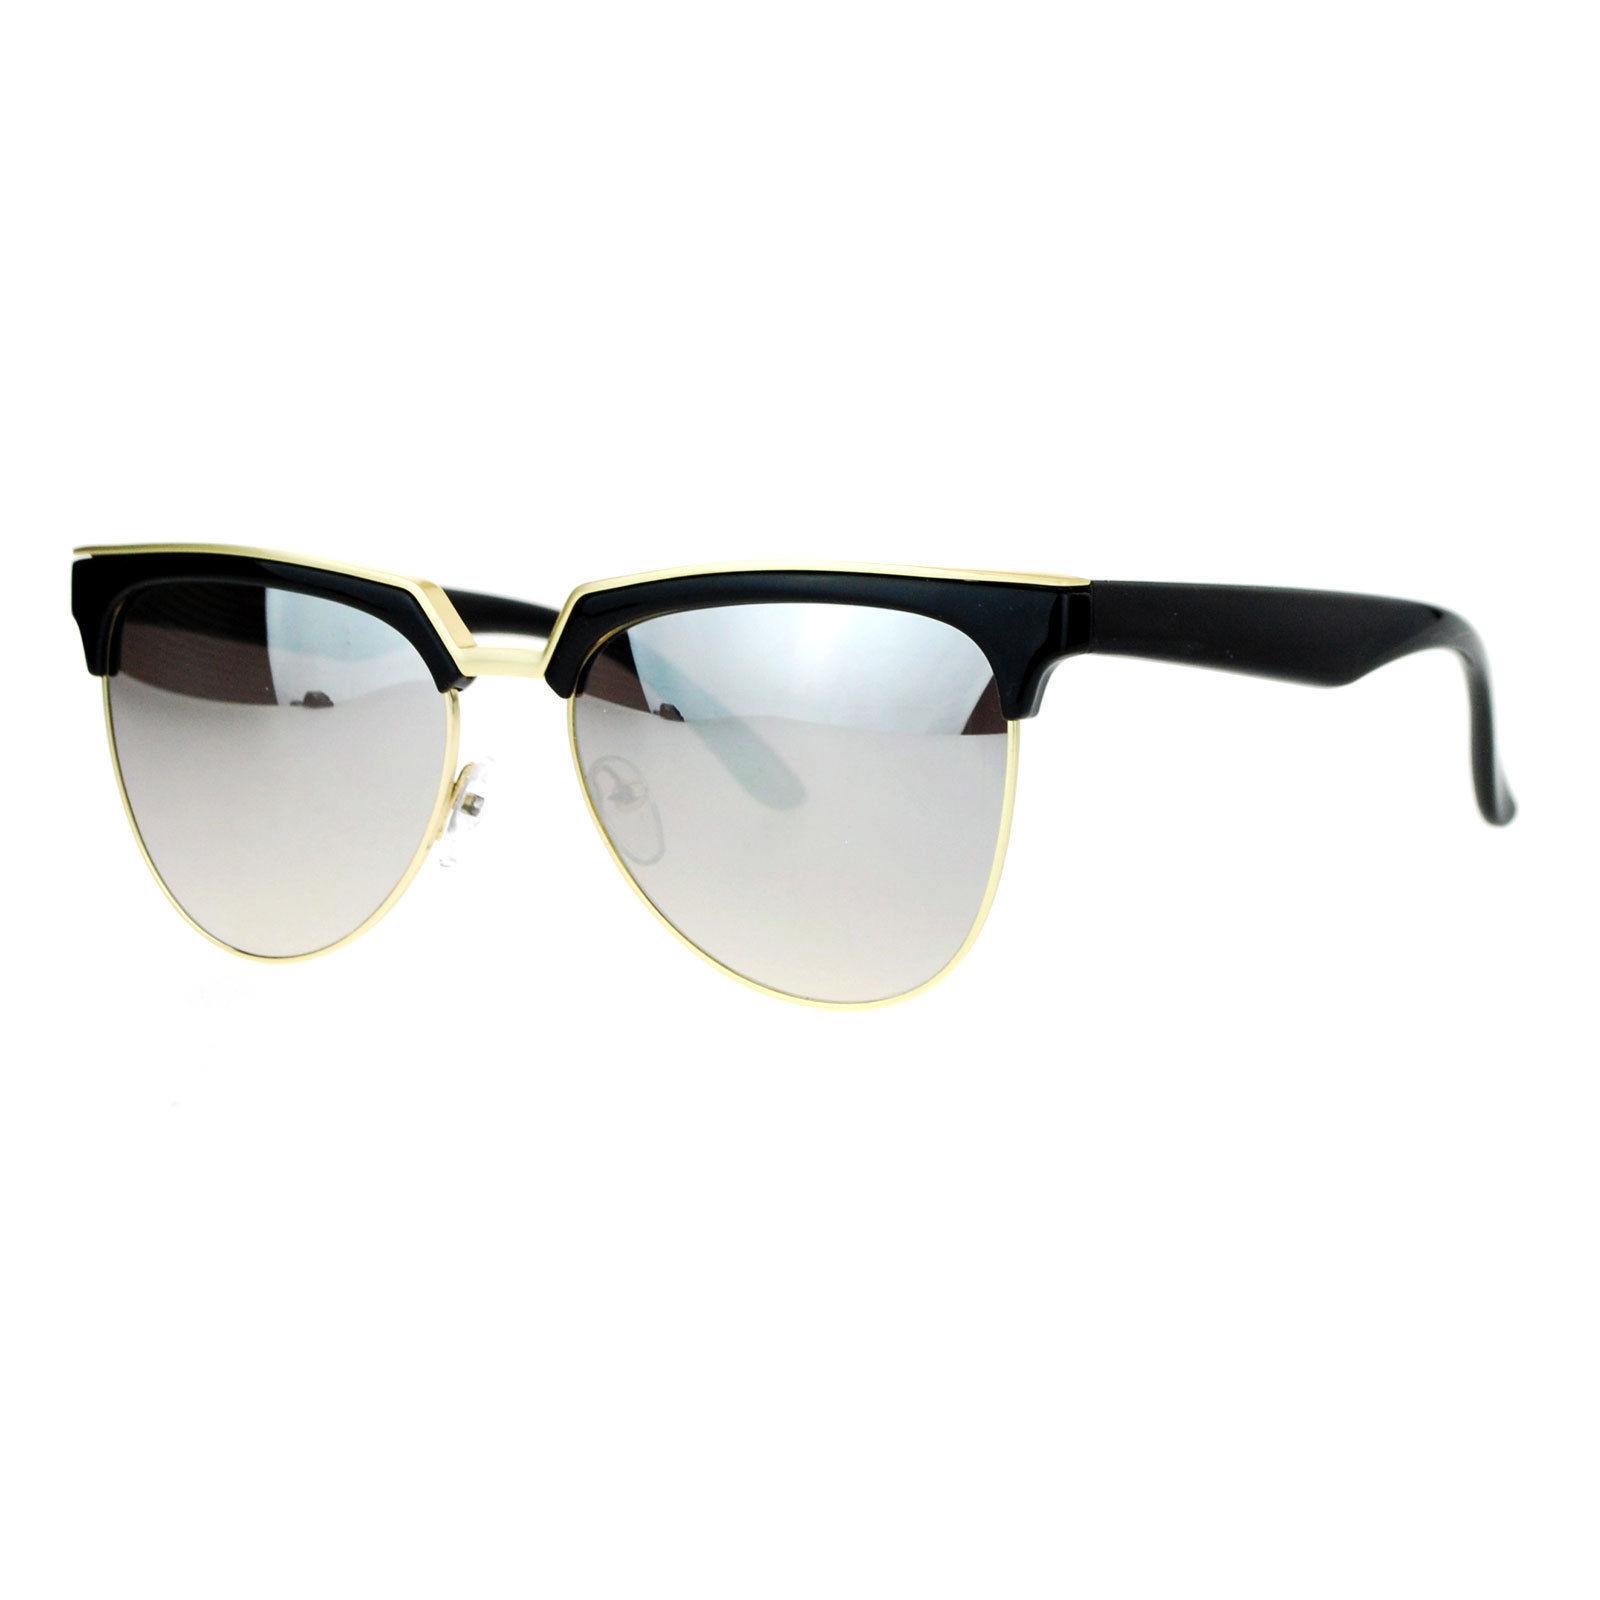 Womens Trendy Top Fashion Sunglasses Stylish Frame Mirror Lens UV 400